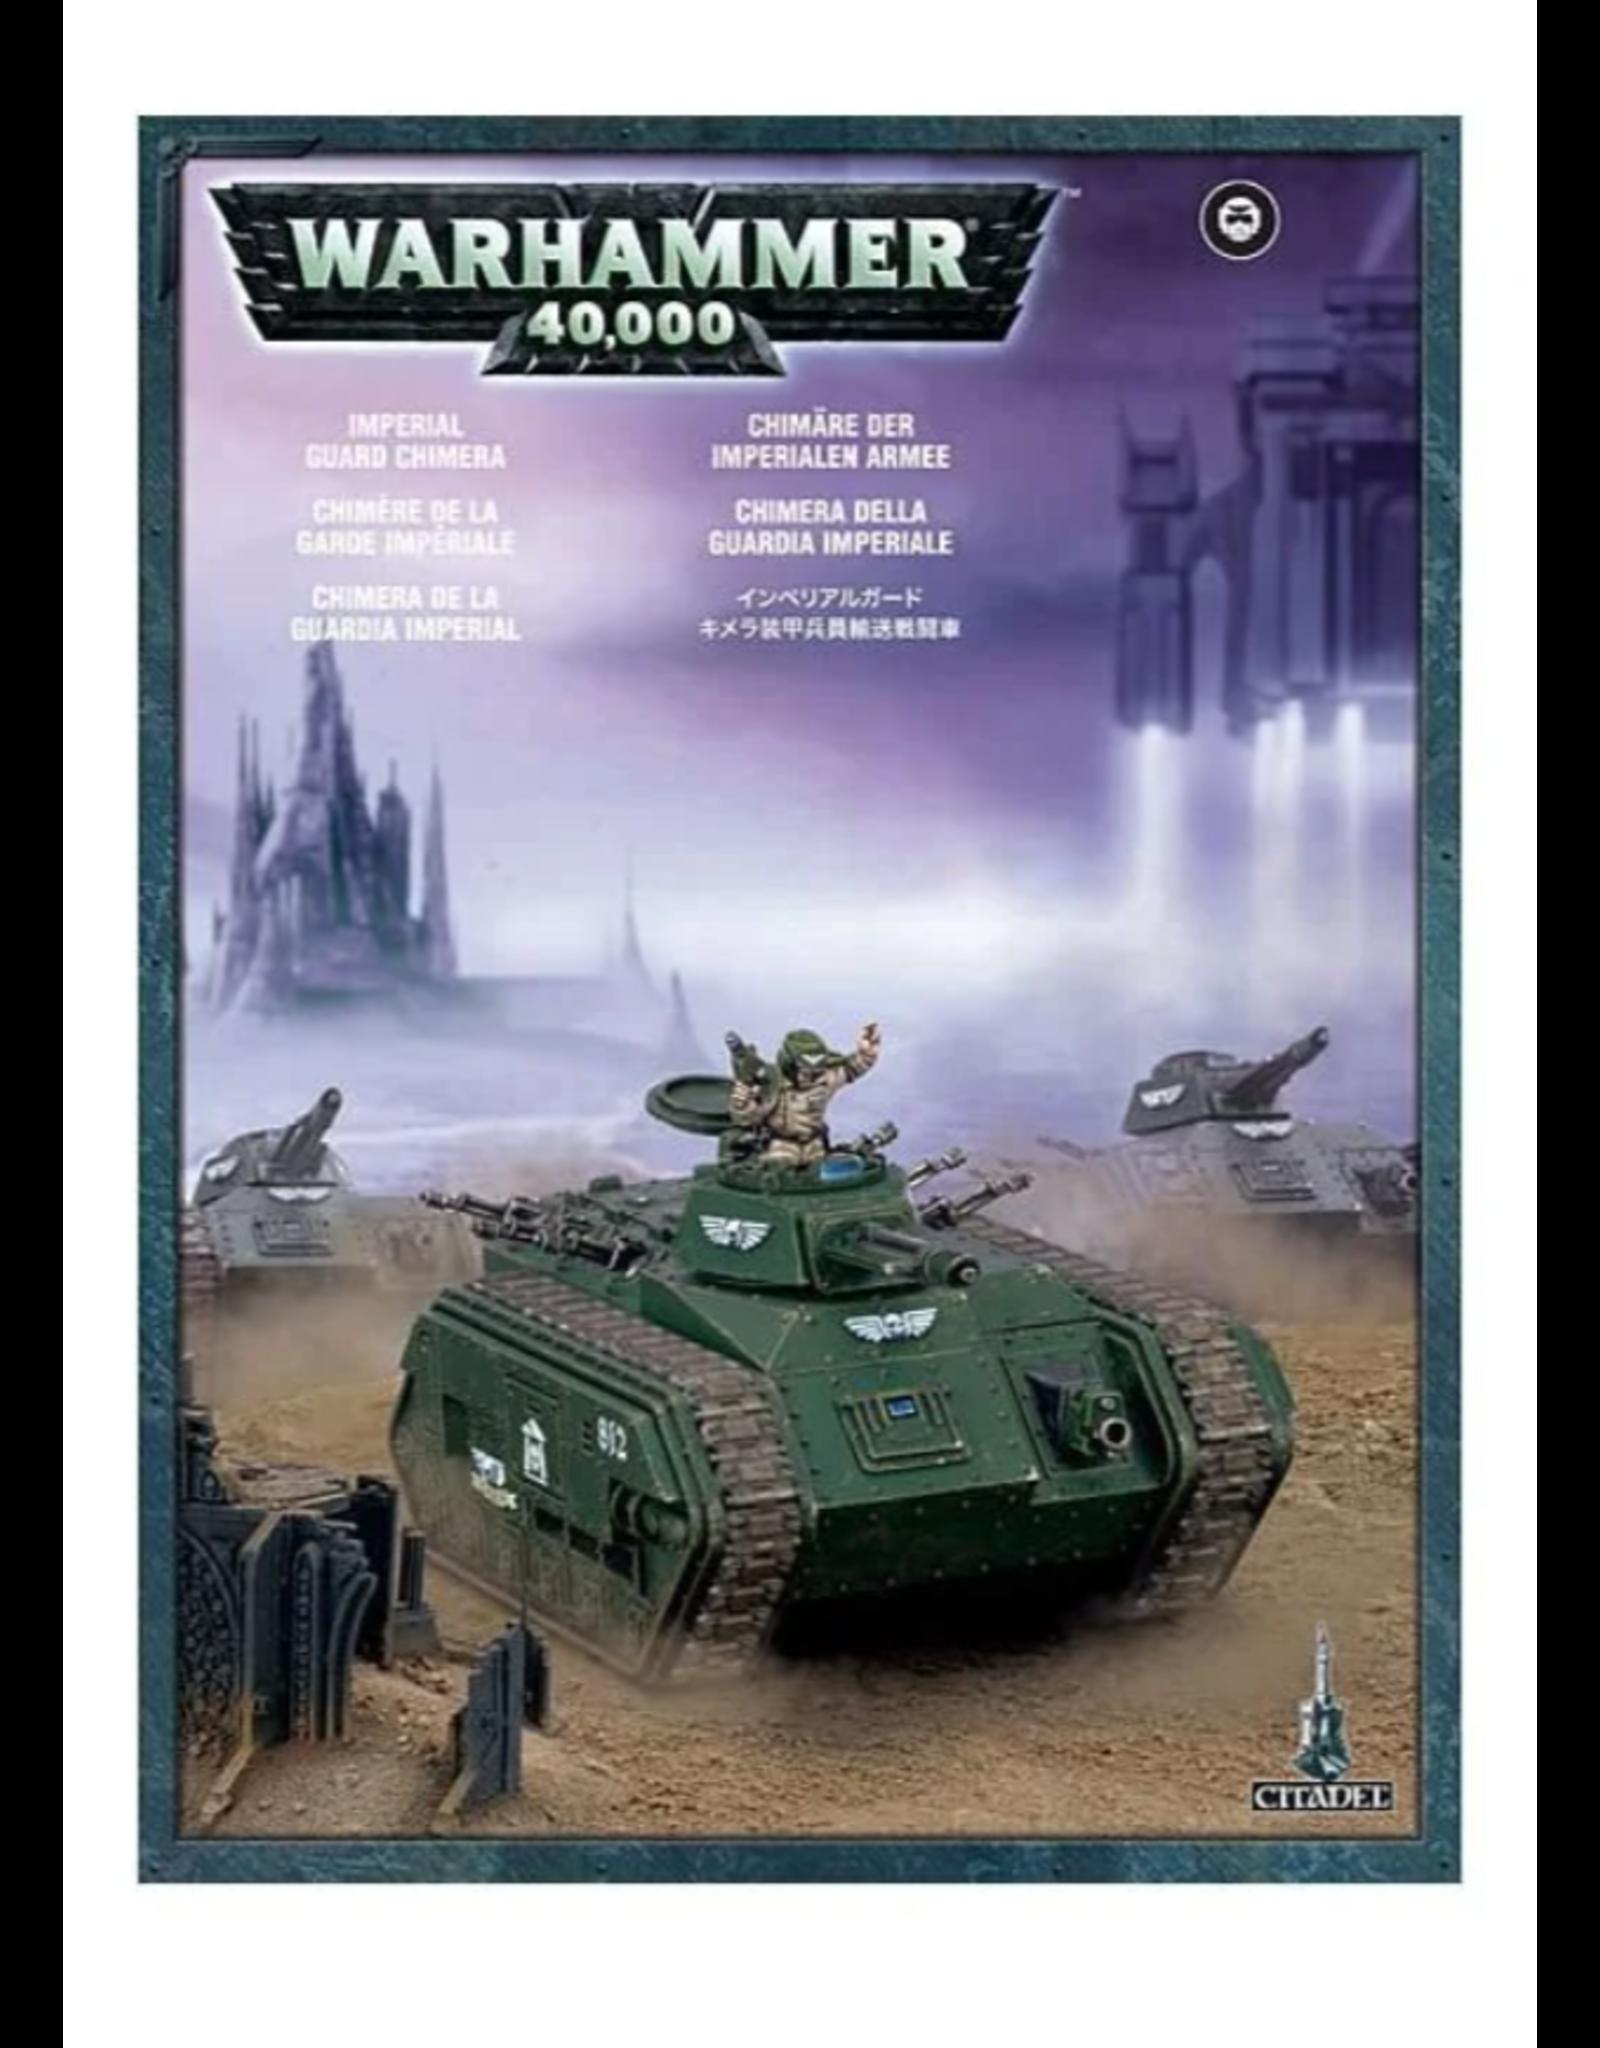 Warhammer 40K Astra Militarum Chimera